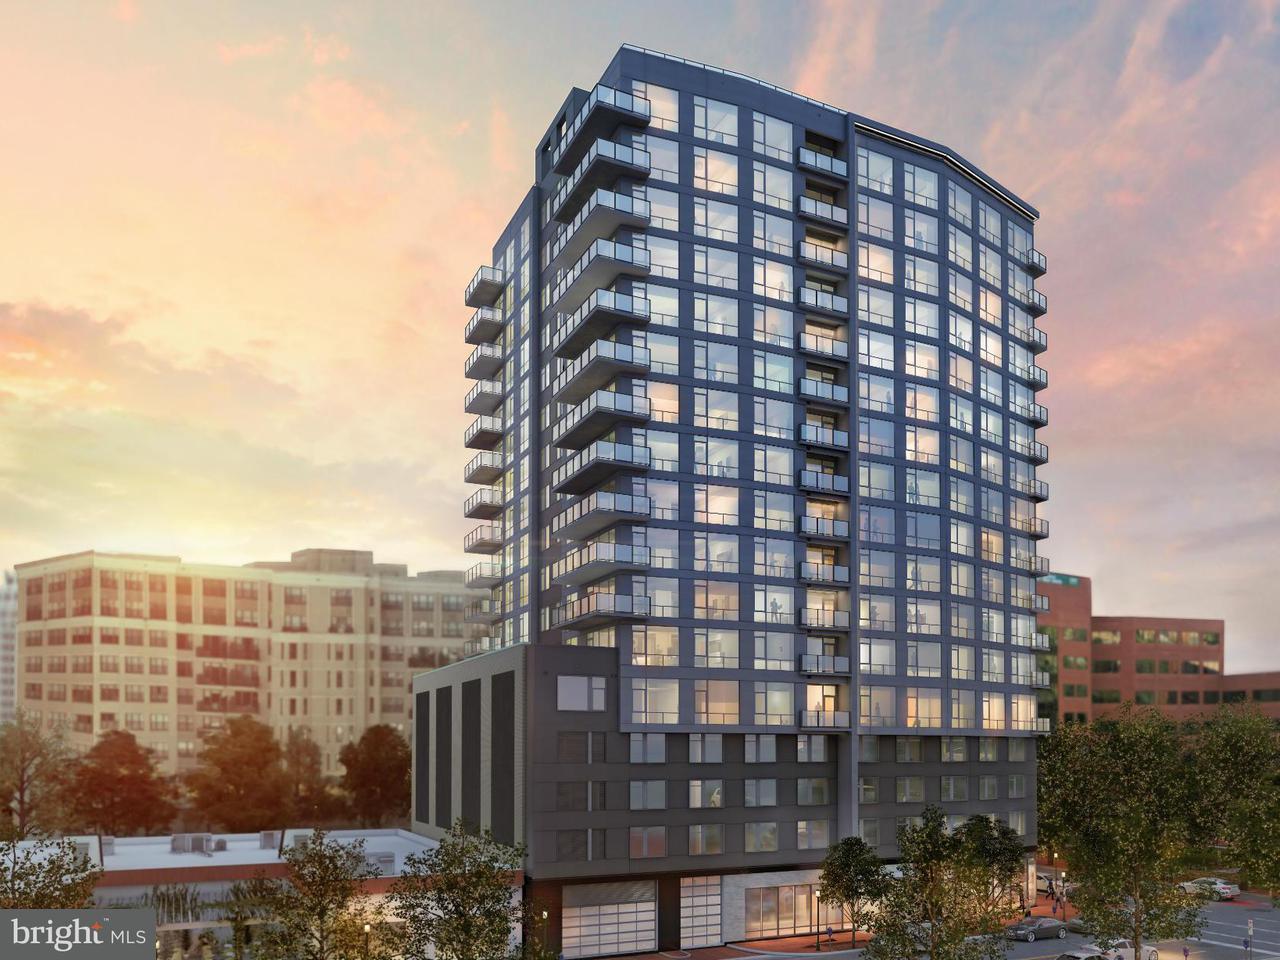 Condominium for Sale at 4960 FAIRMONT AVE #1703 4960 FAIRMONT AVE #1703 Bethesda, Maryland 20814 United States